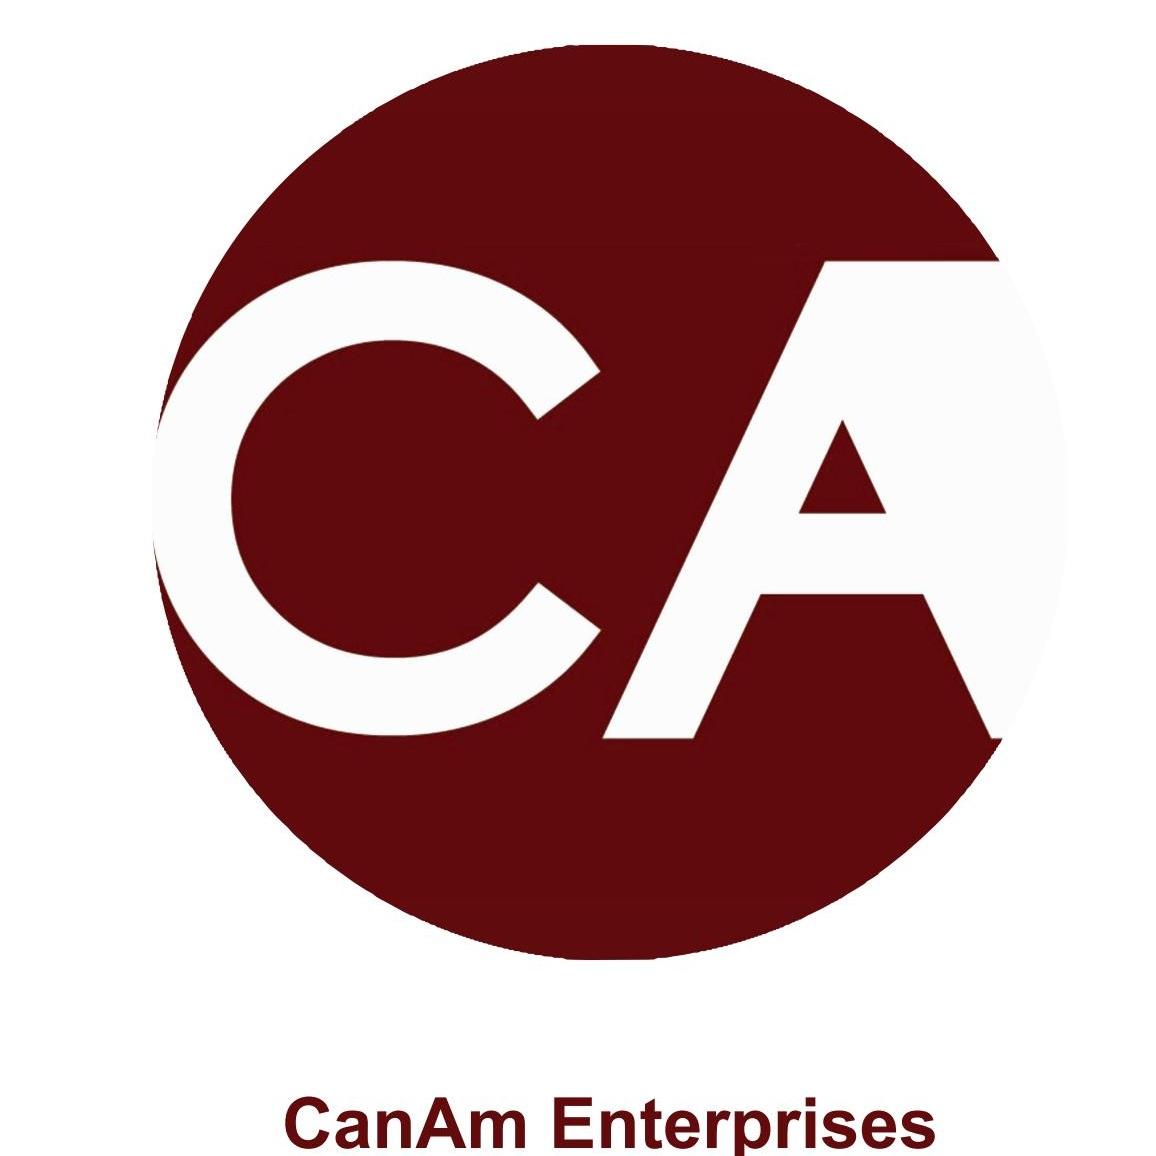 CanAm+Enterprises+Logo.jpg